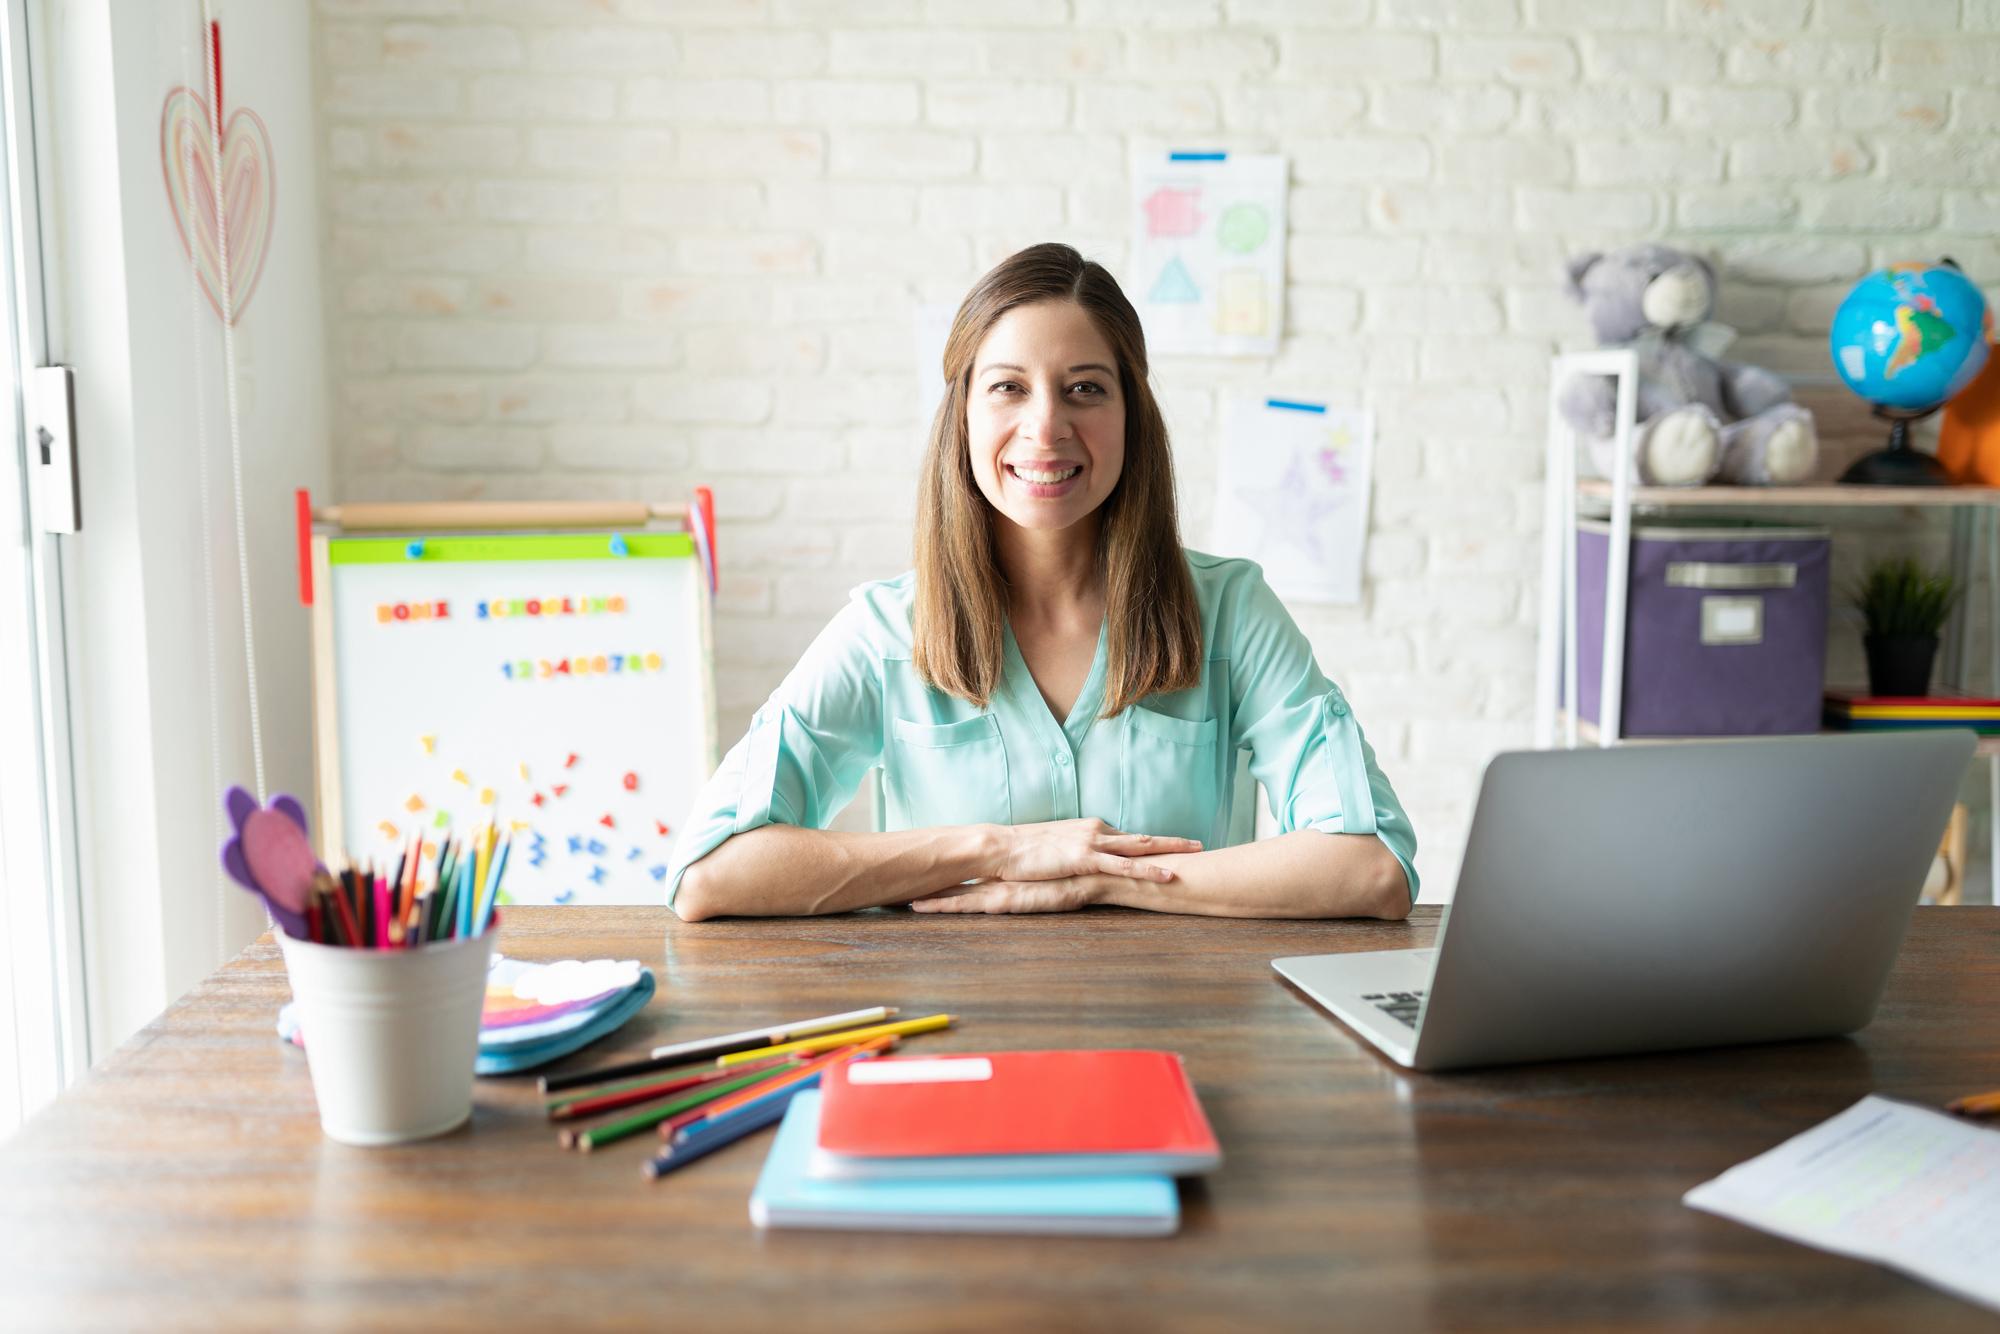 teacher sitting at desk